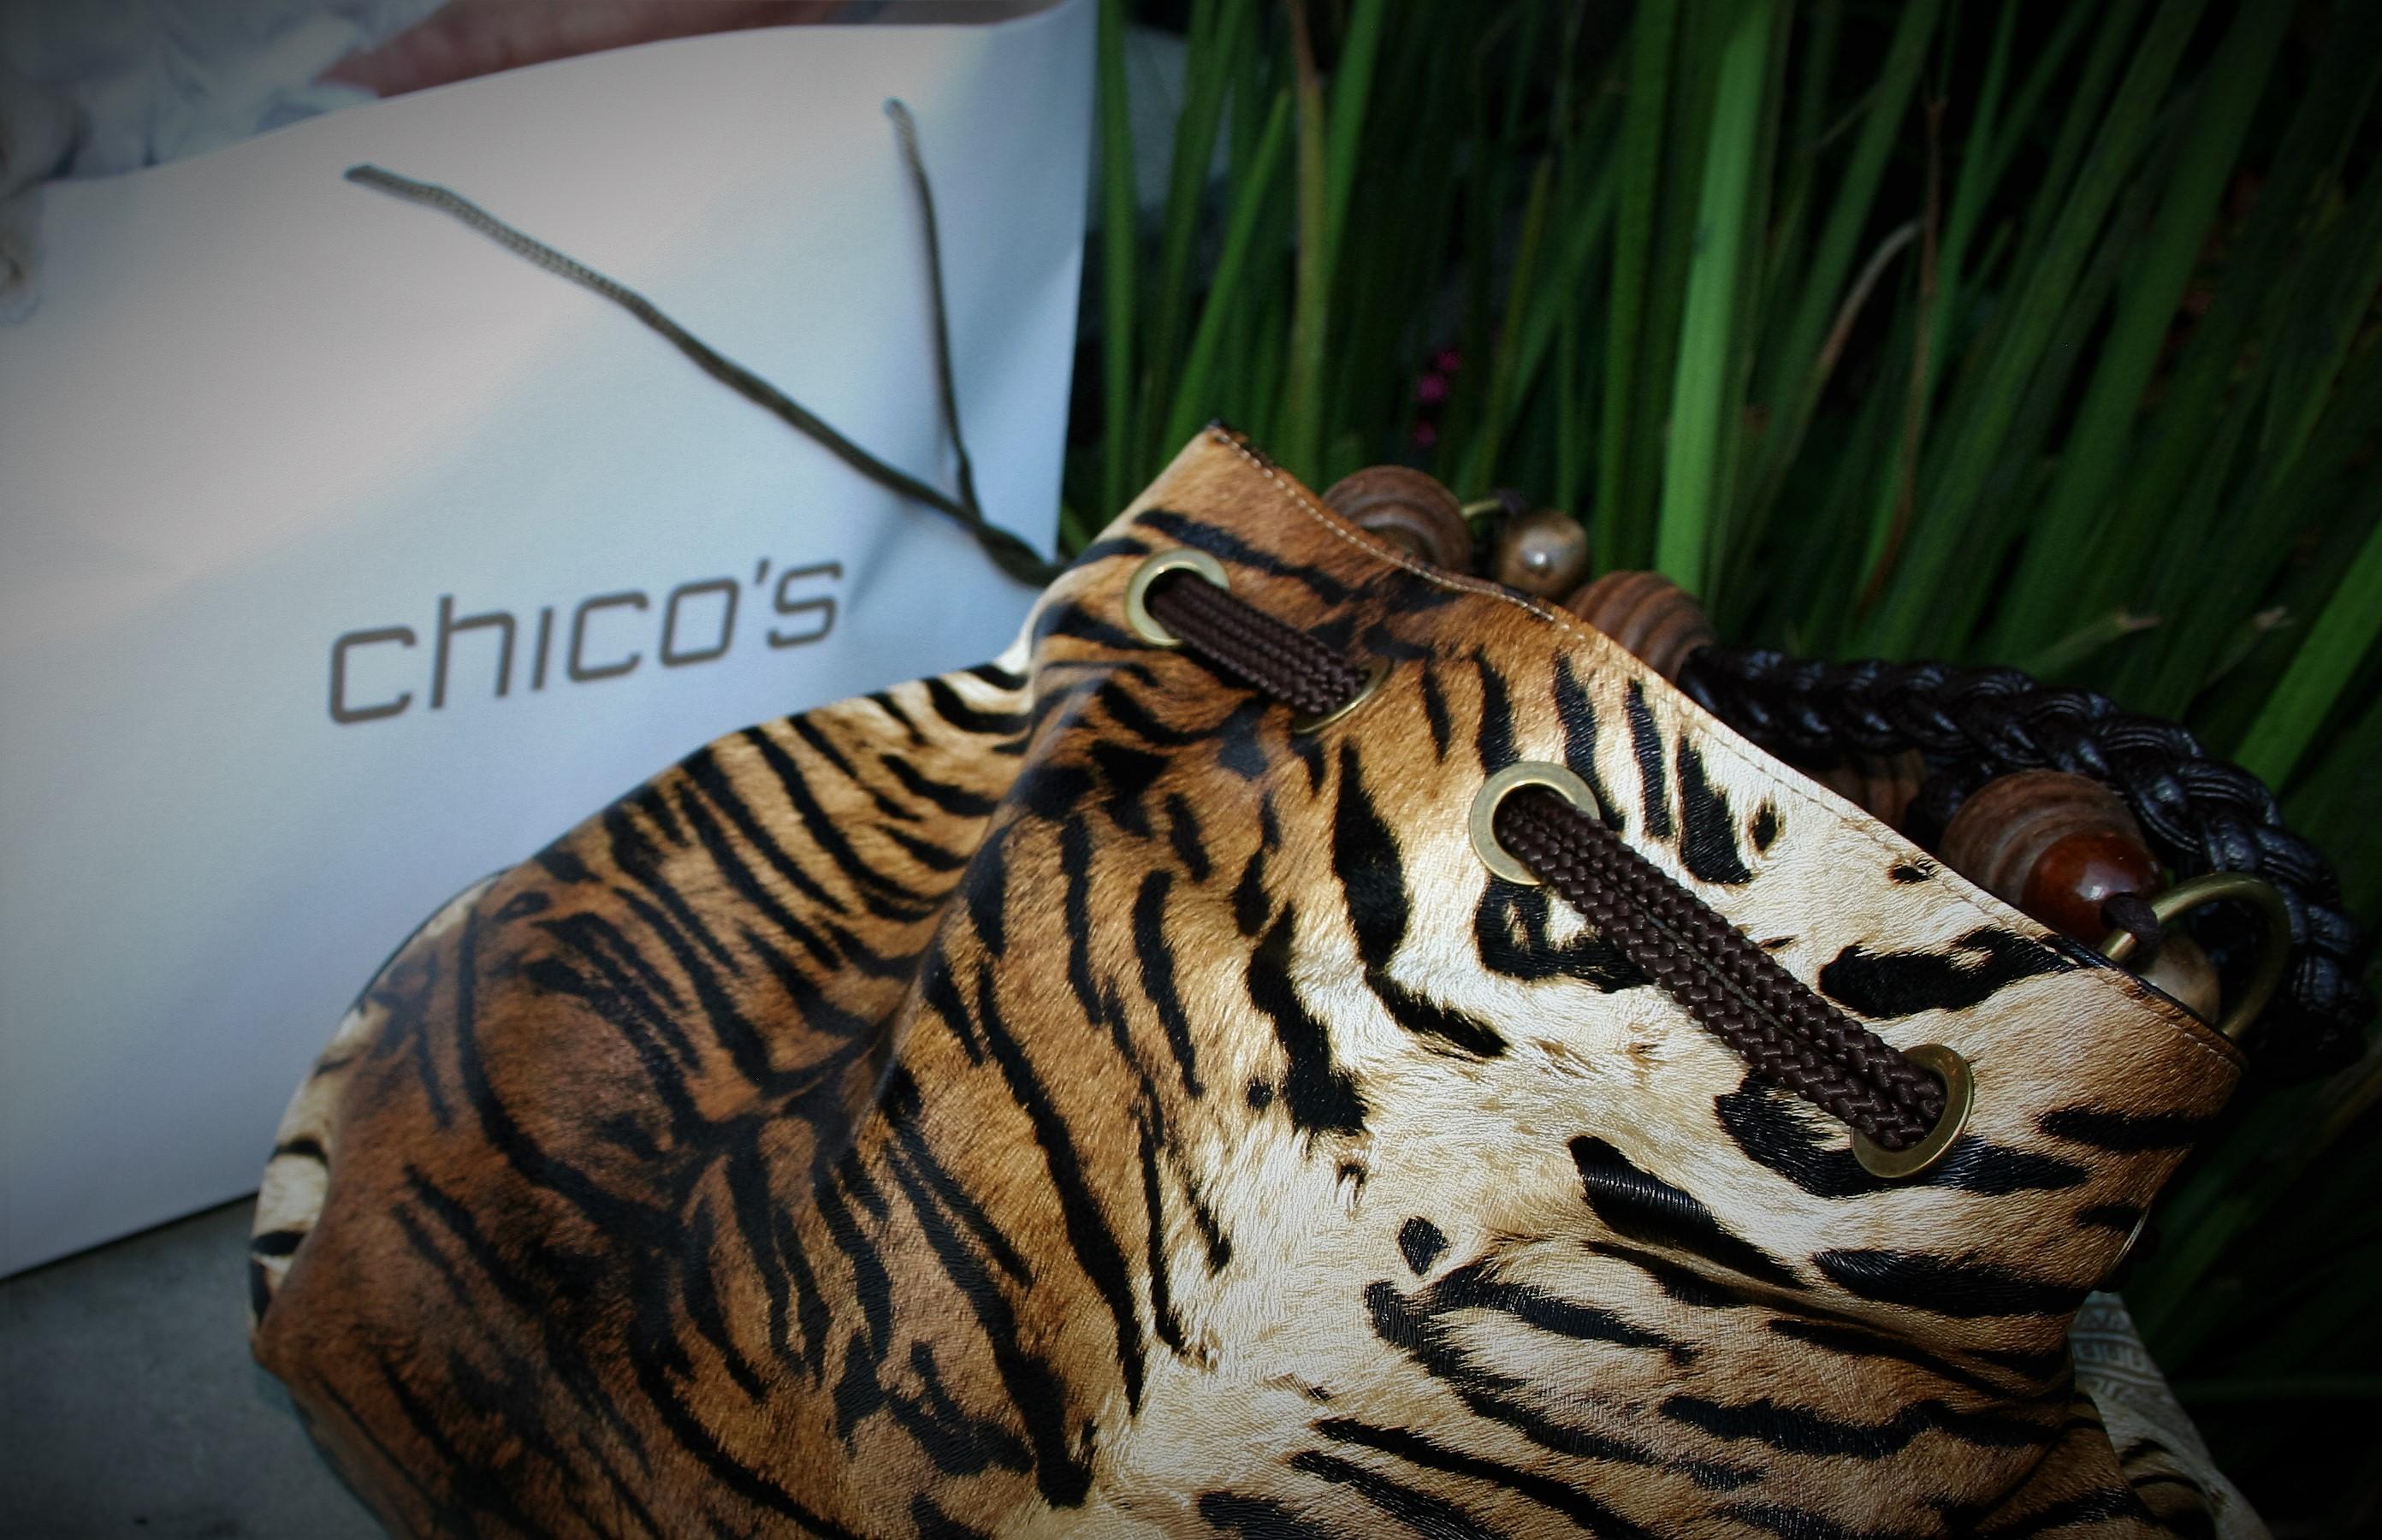 chicos, chicos purse, chicos tiger print purse